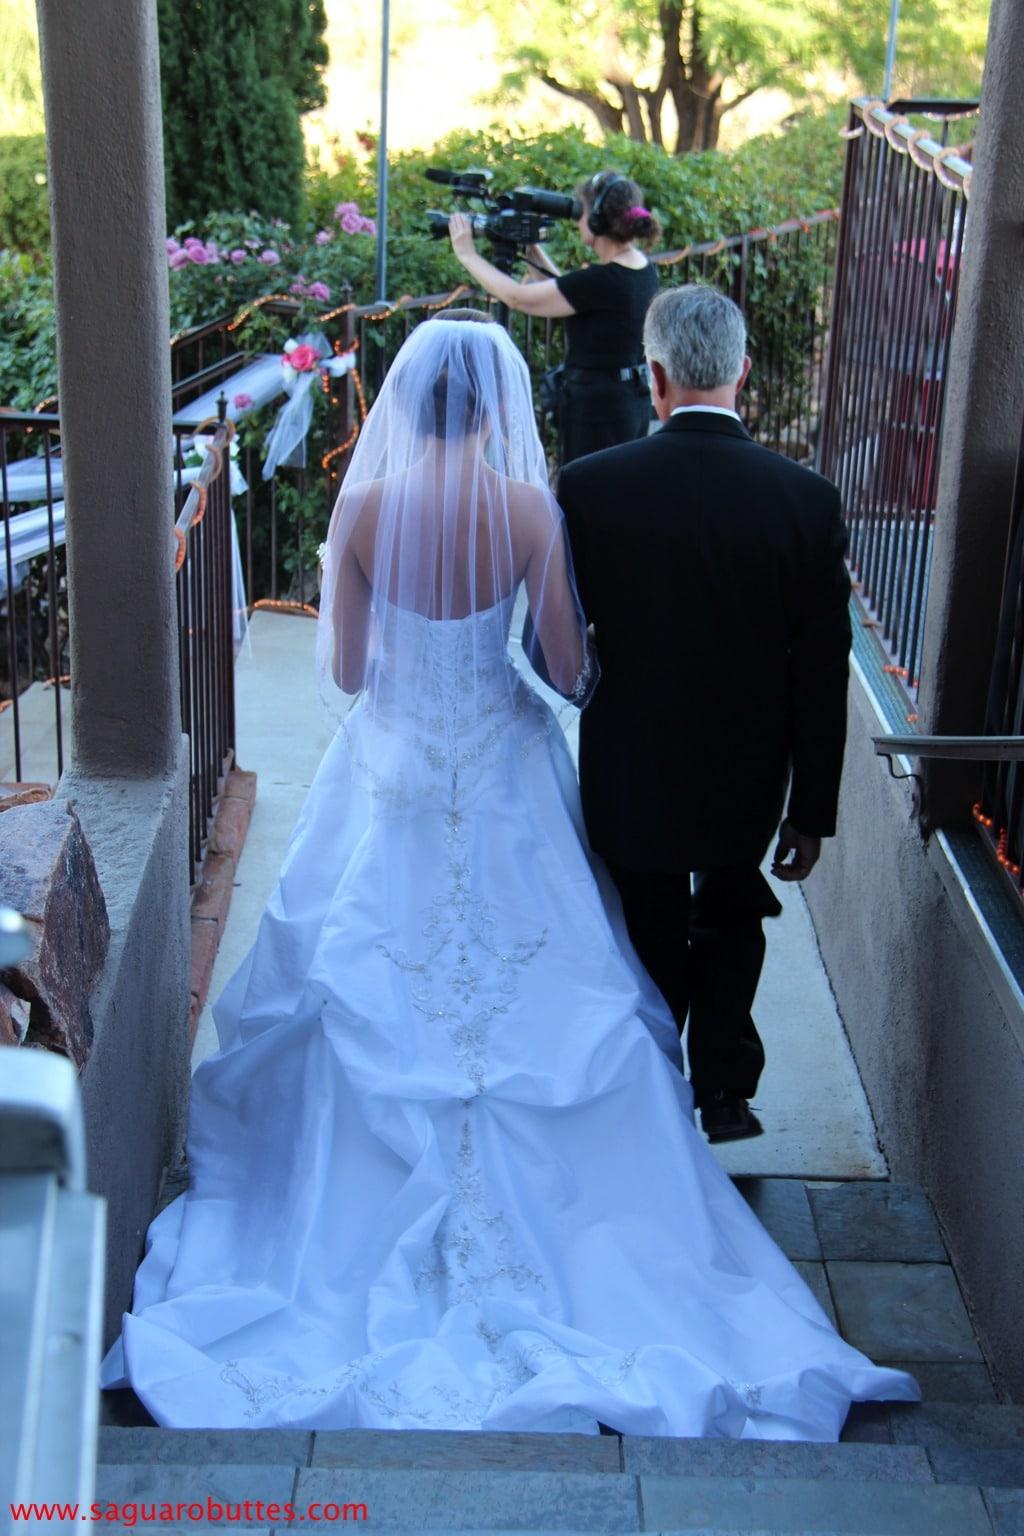 Wedding Gown Preservation Tips - My Tucson Wedding